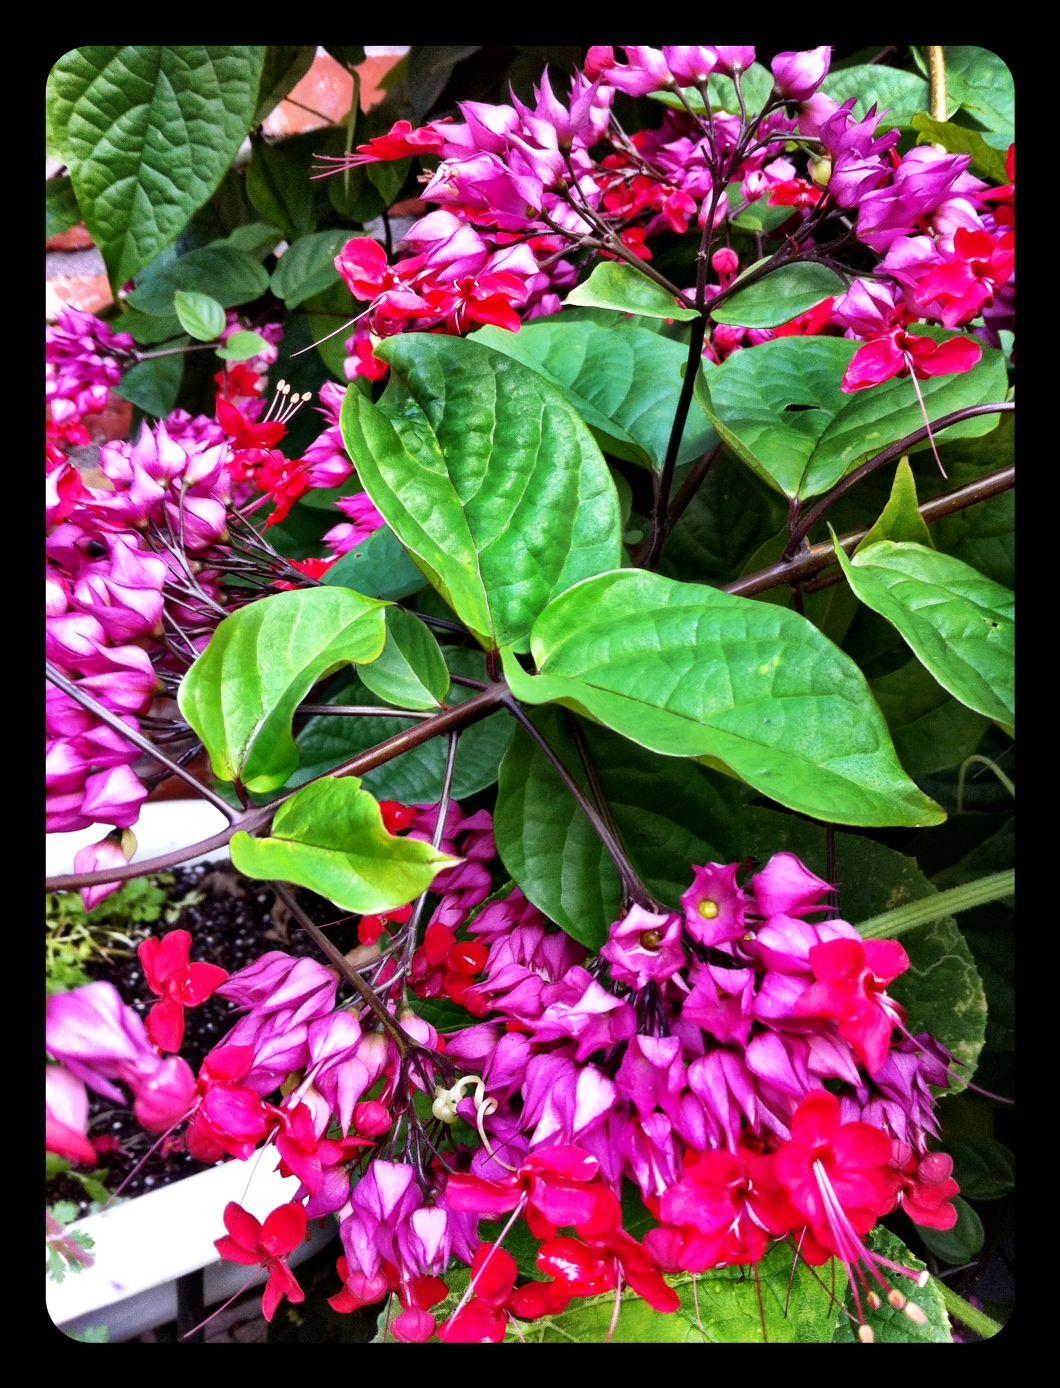 Reciprocity A Pleasant House Plants Bleeding Heart Planting Flowers